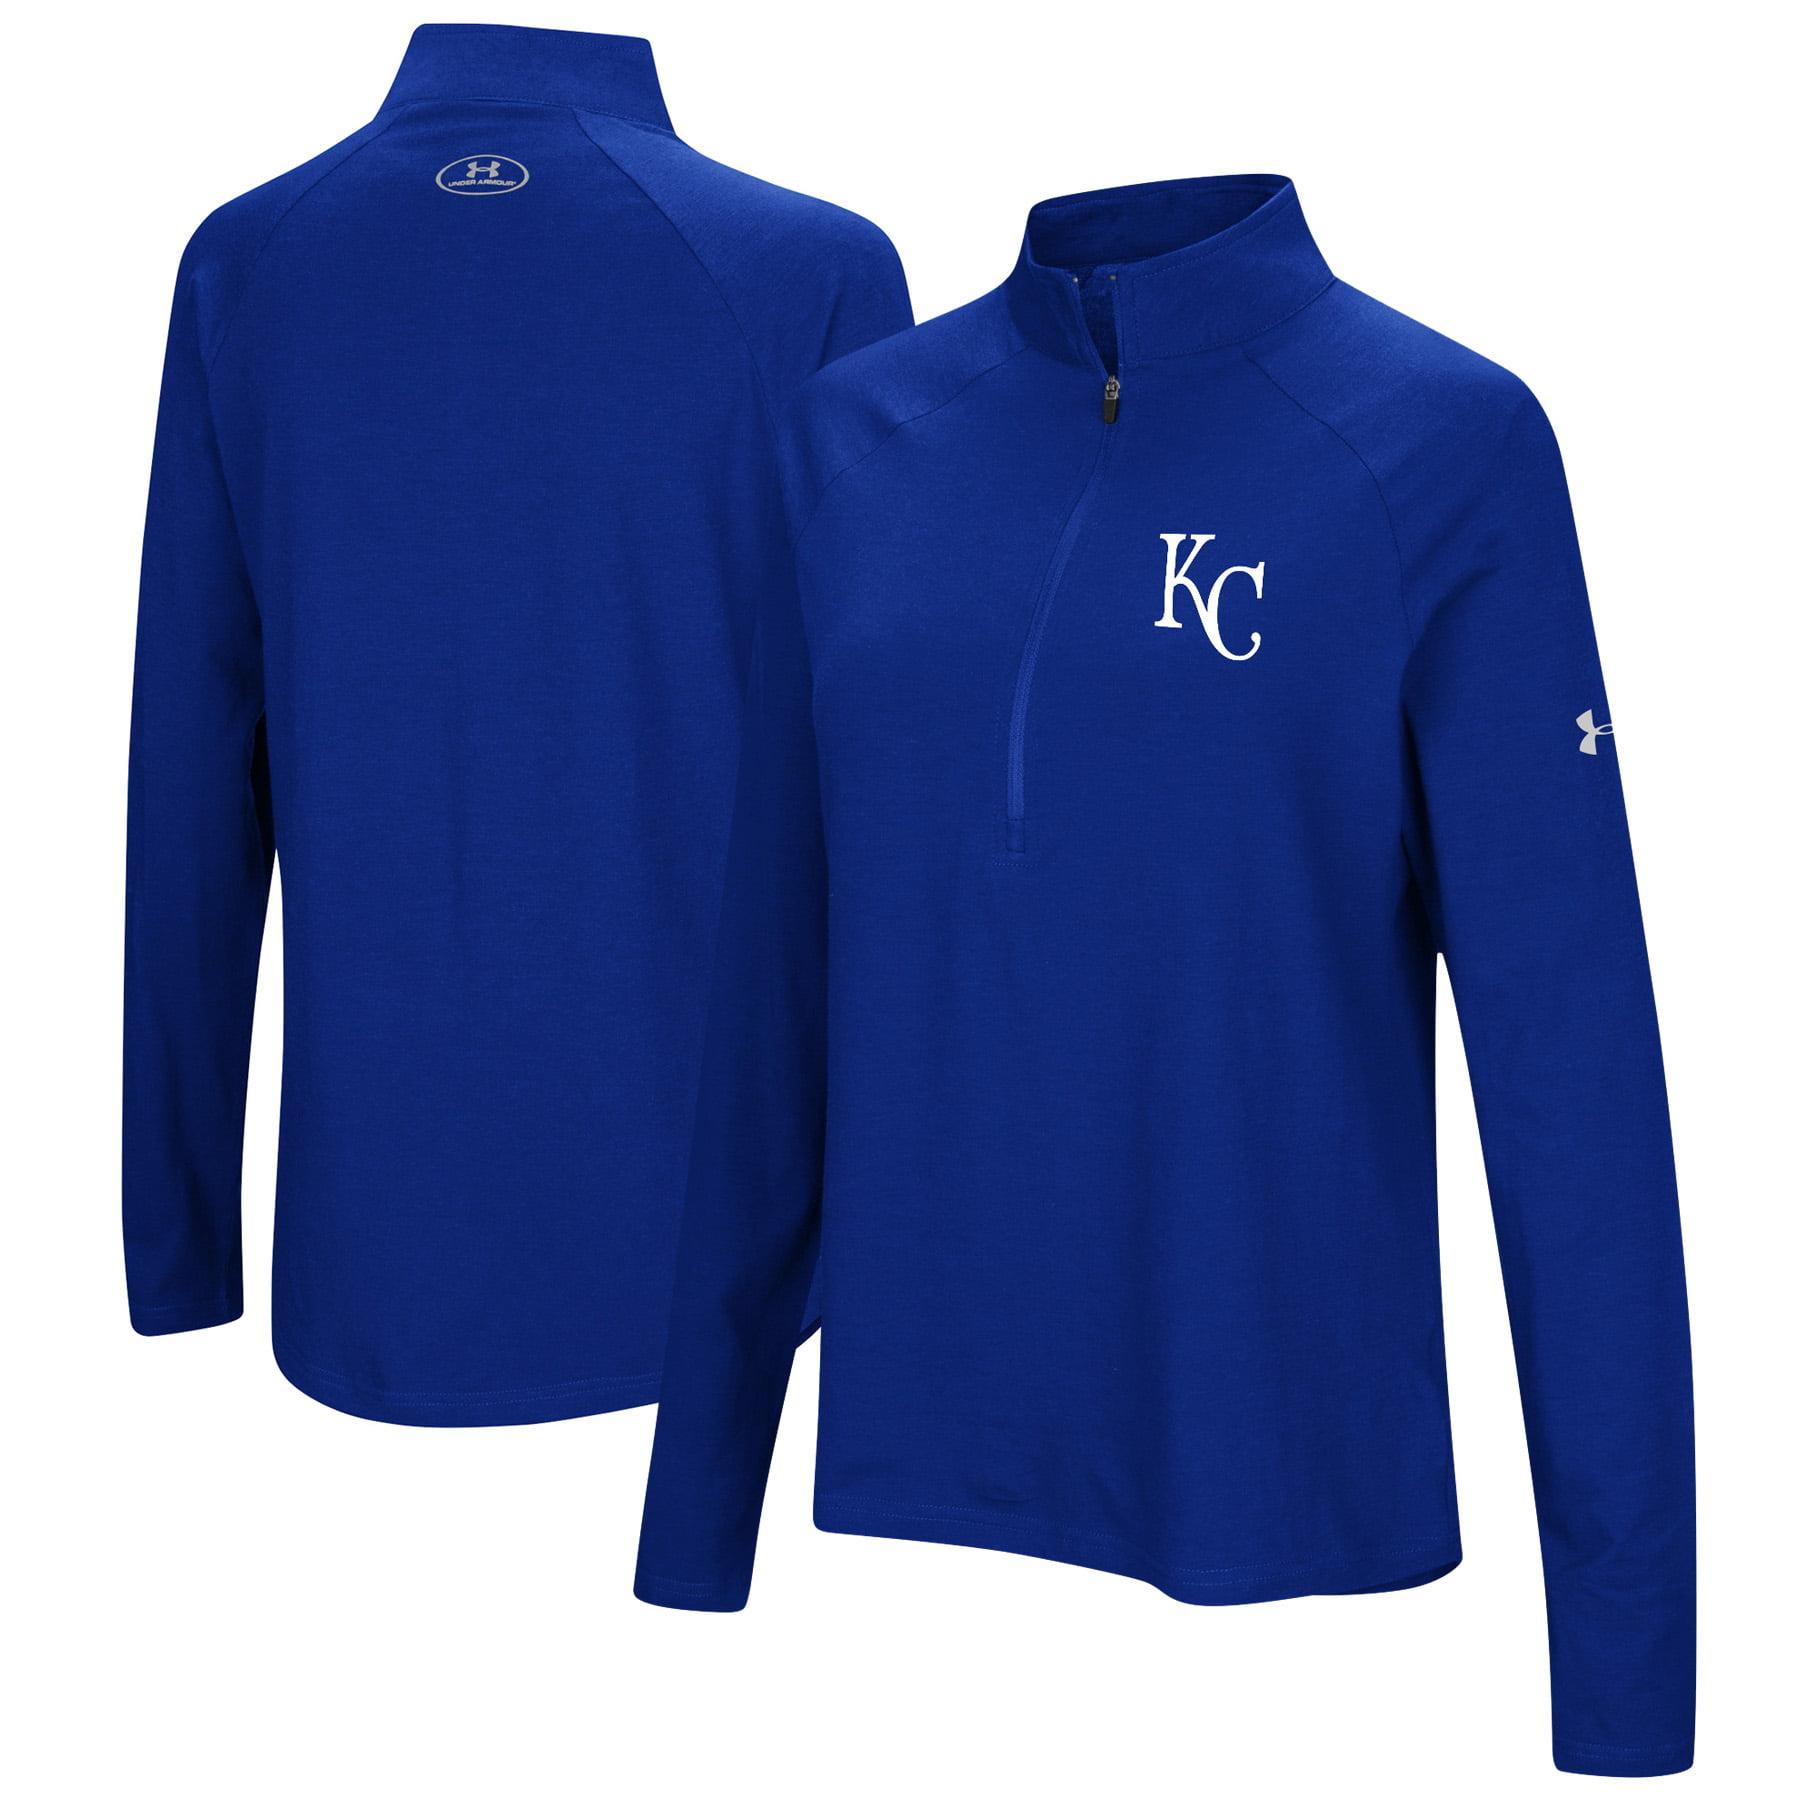 Kansas City Royals Under Armour Women's Passion Performance Tri-Blend Raglan Half-Zip Pullover Jacket - Royal